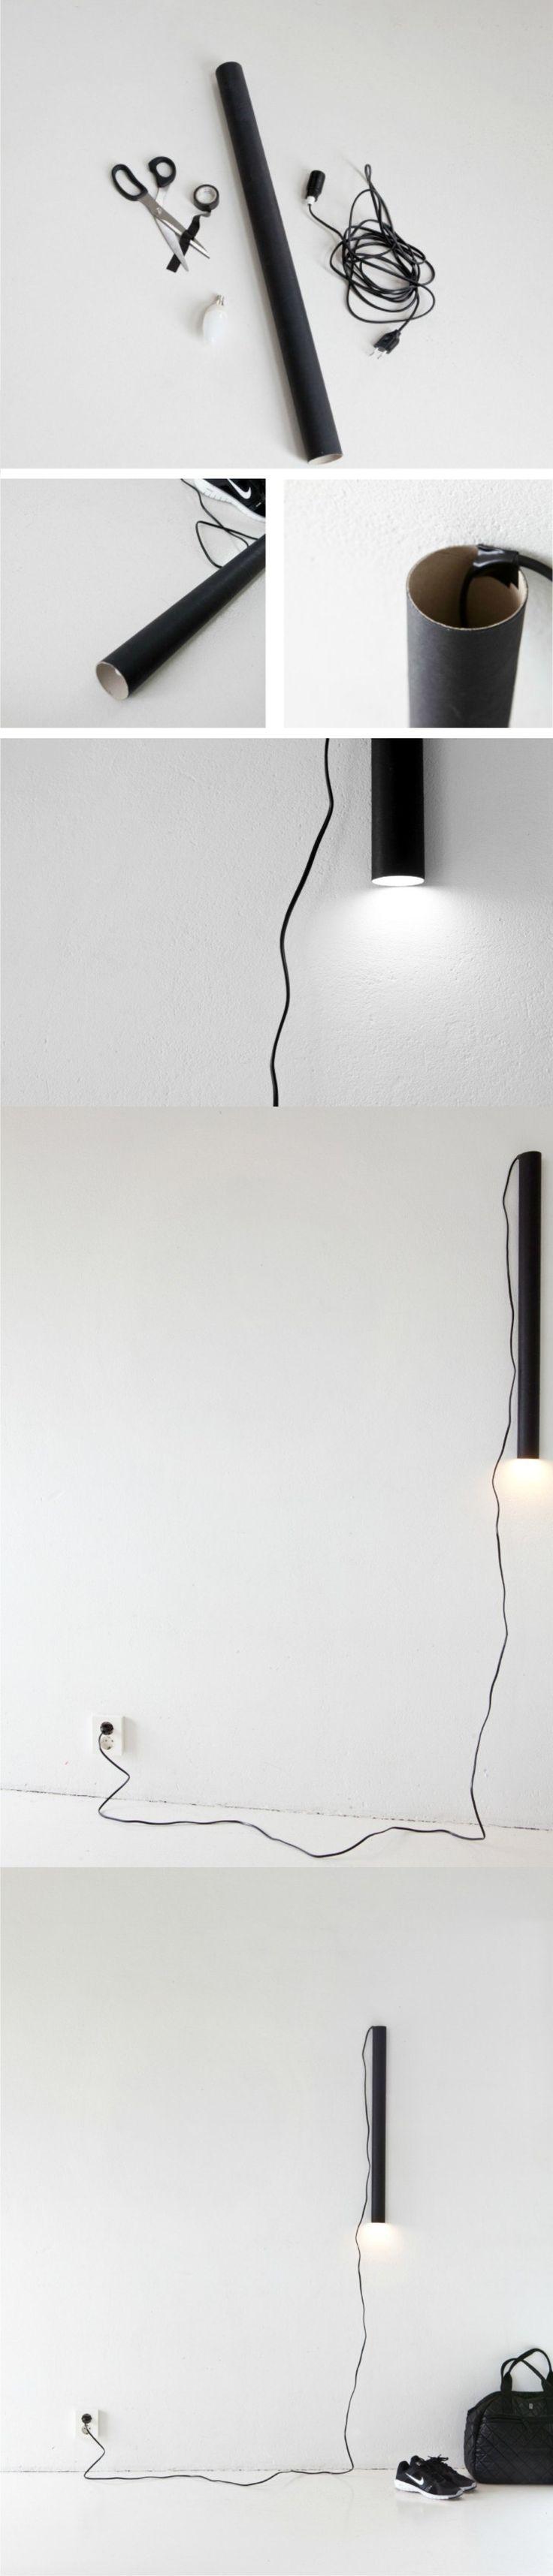 Lámpara DIY con tubo de cartón - annaleenashem.blogspot.com - DIY Cardboard Tube Lamp